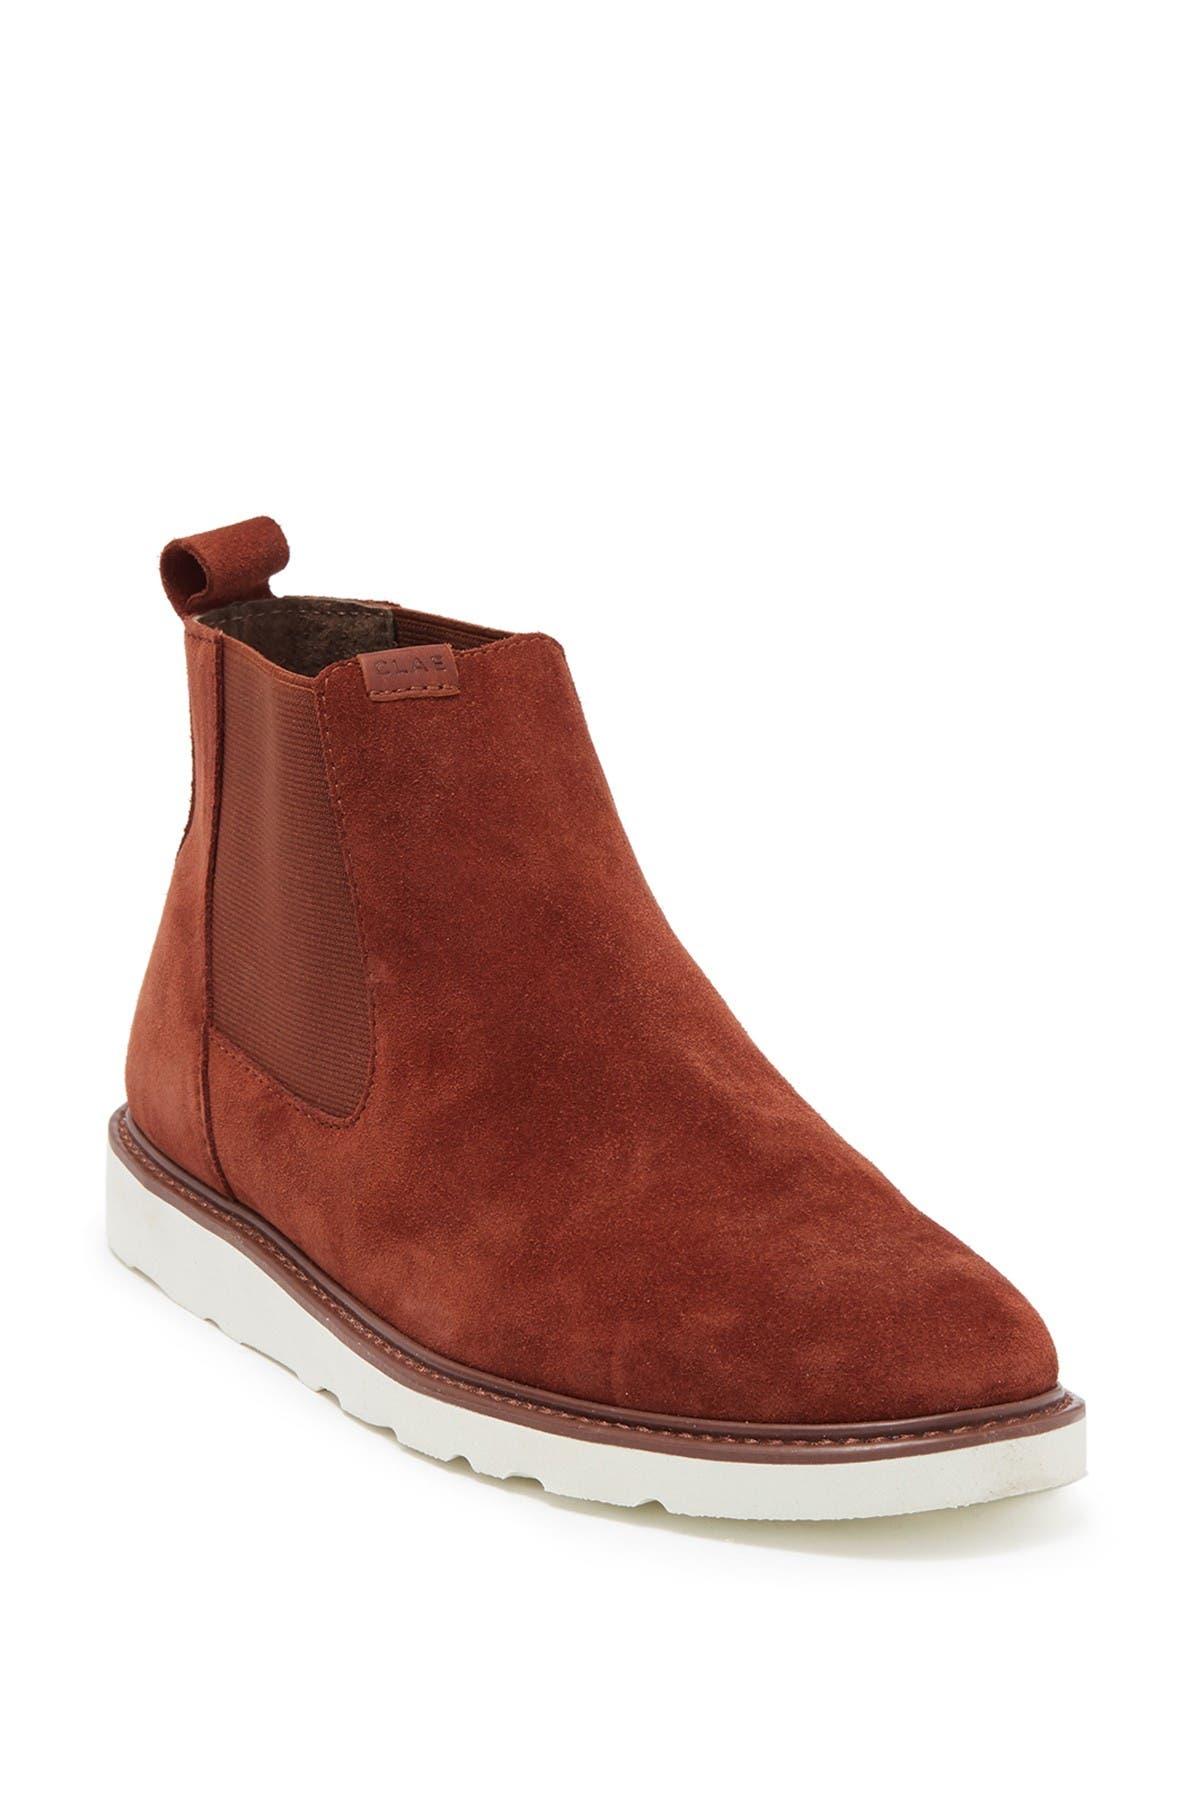 Image of Clae Richards Vibram Boot